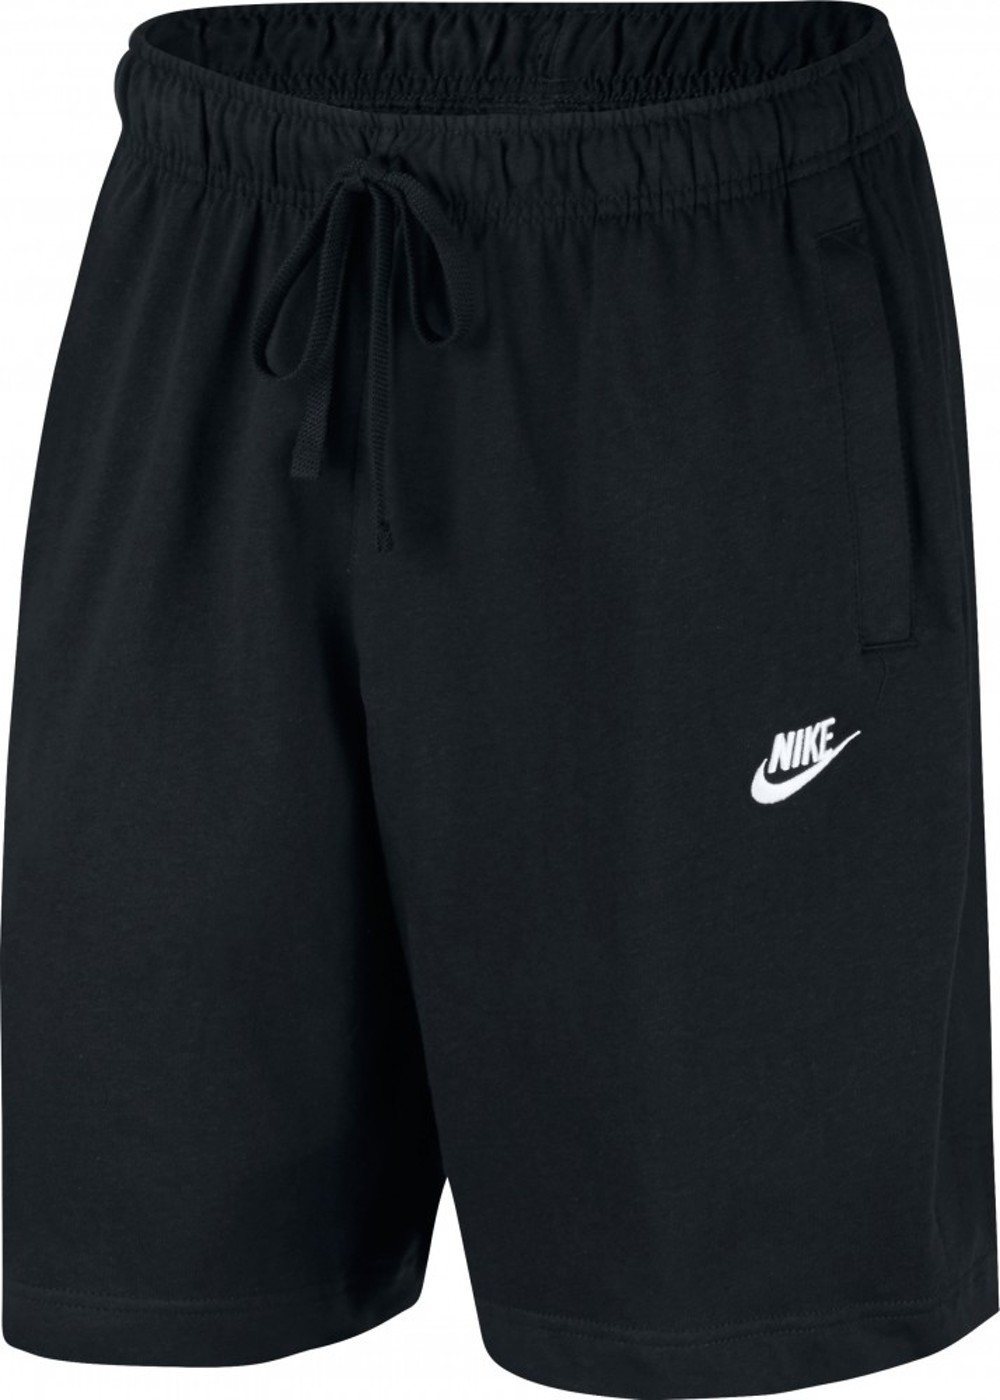 Nike Sportswear Club Sho - Herren